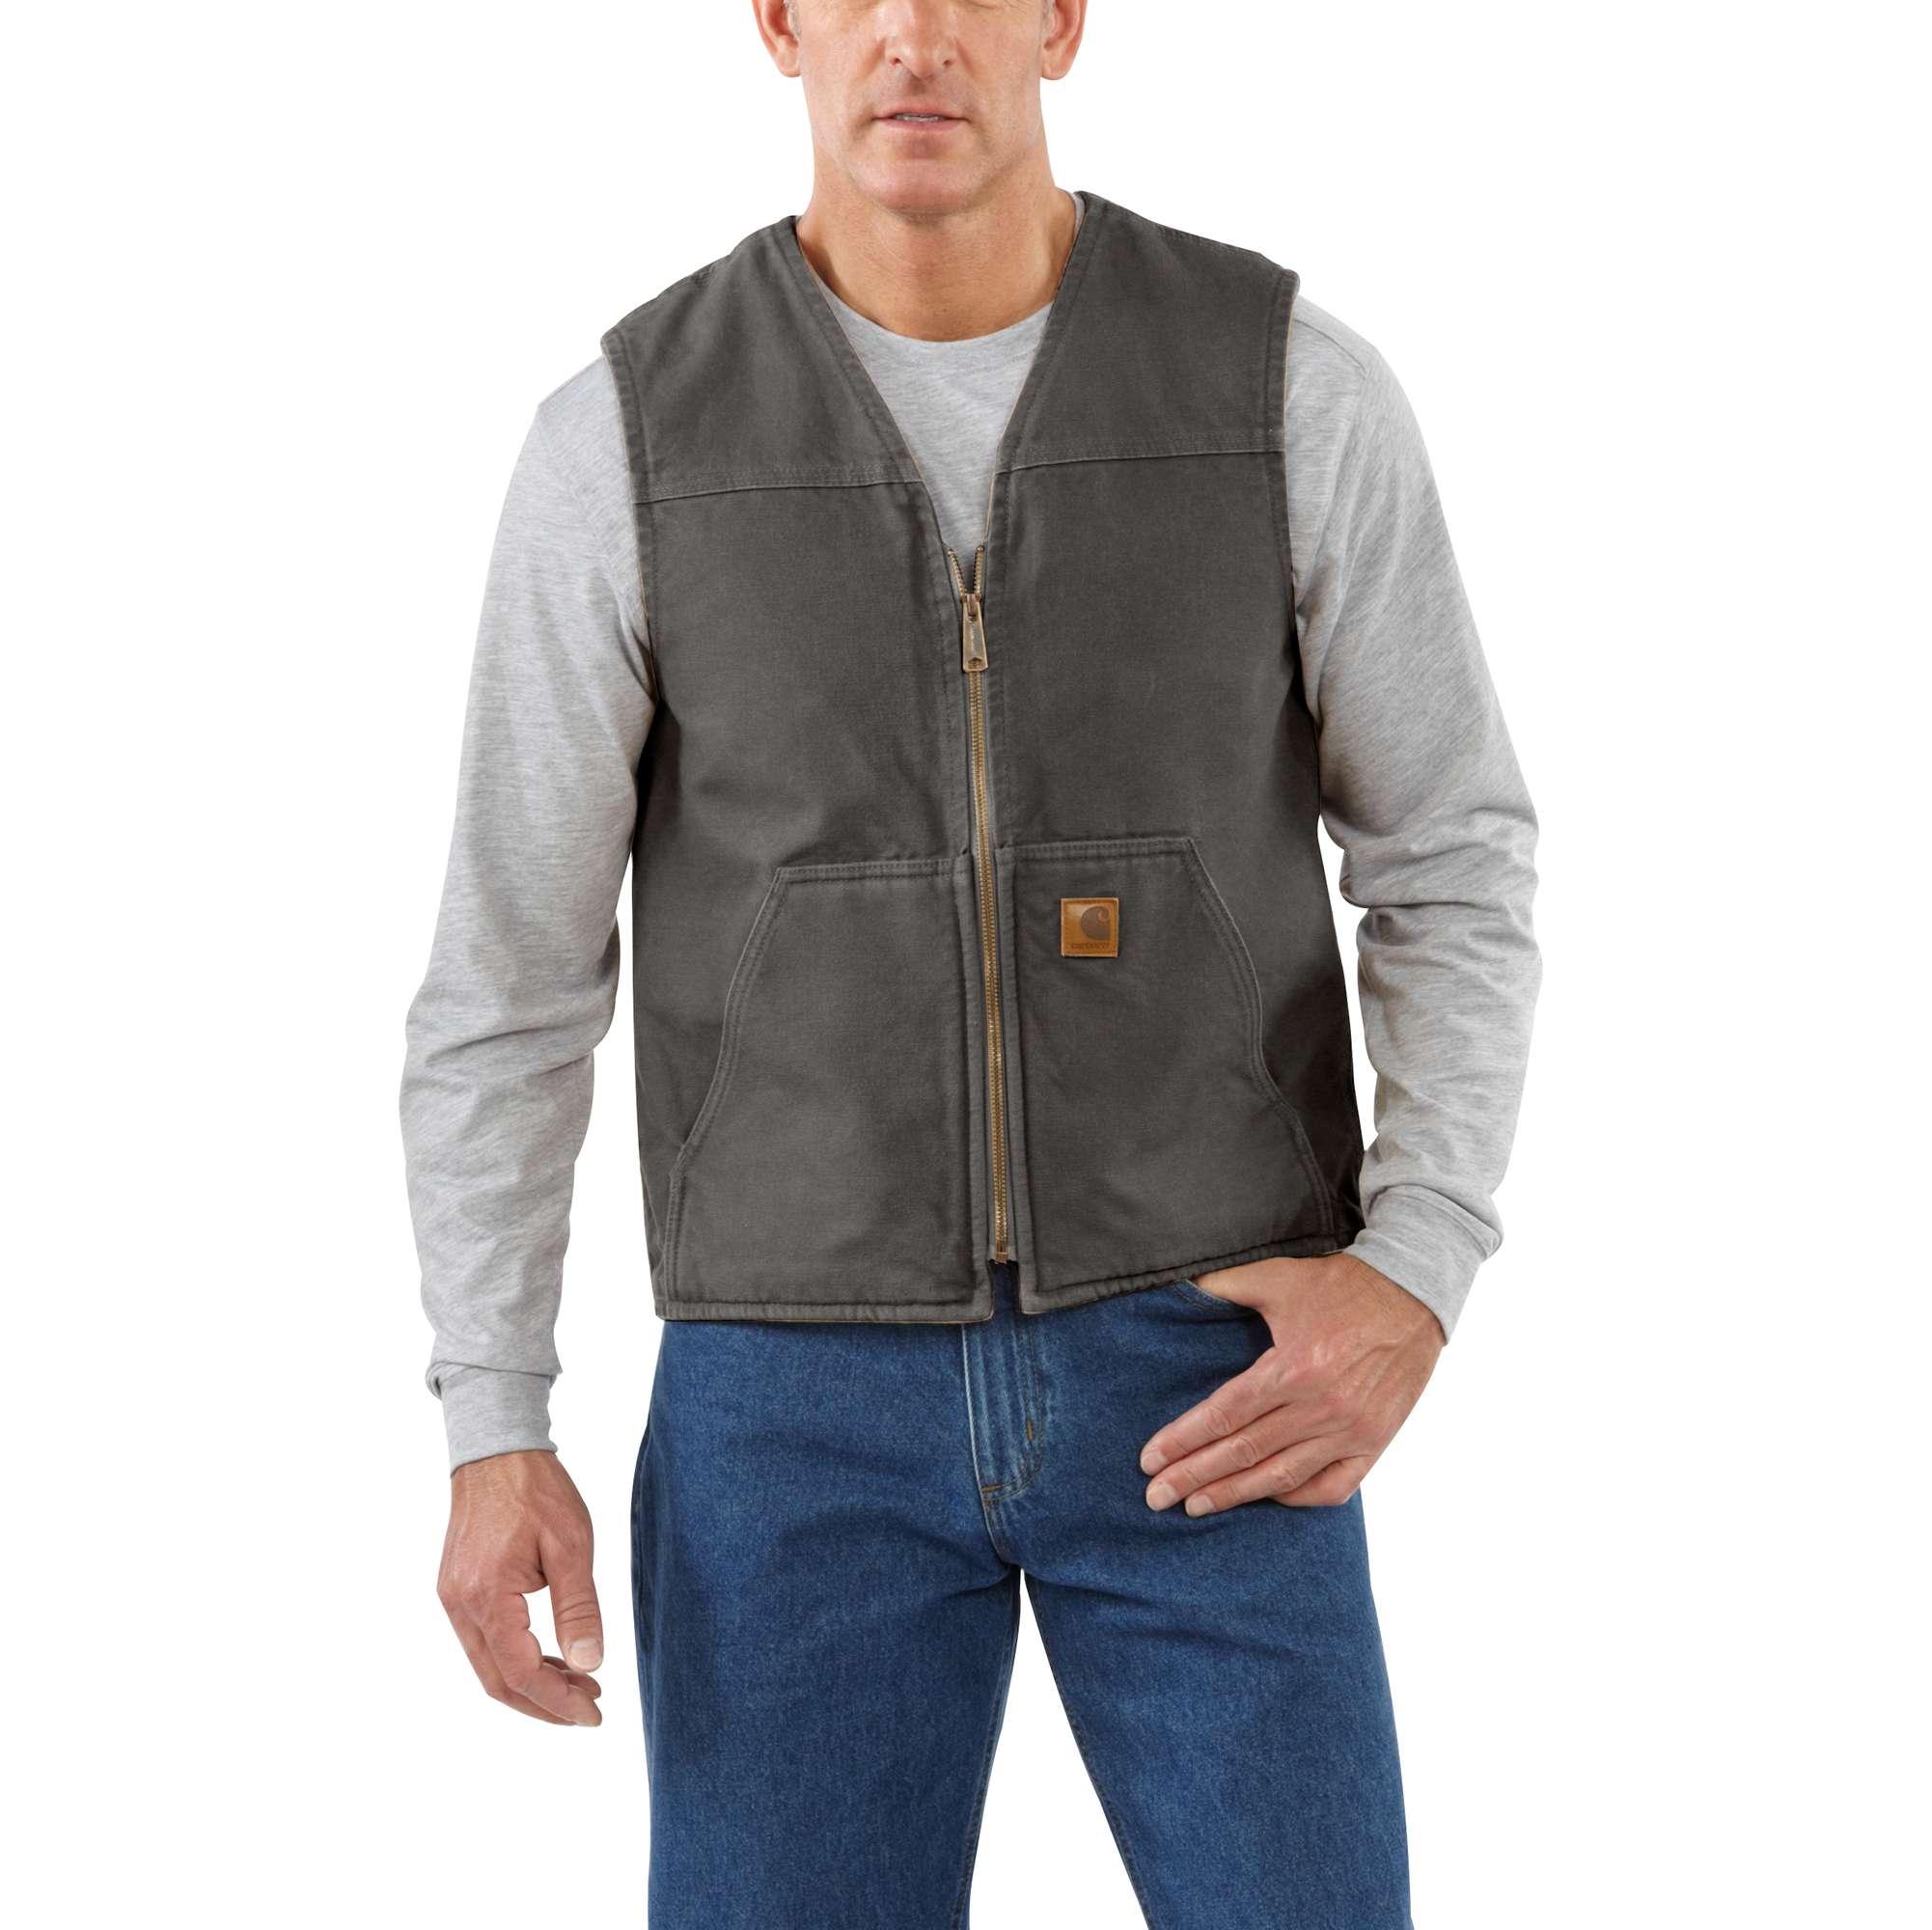 Men's Sandstone Rugged Sherpa Lined Vest, Brown, swatch